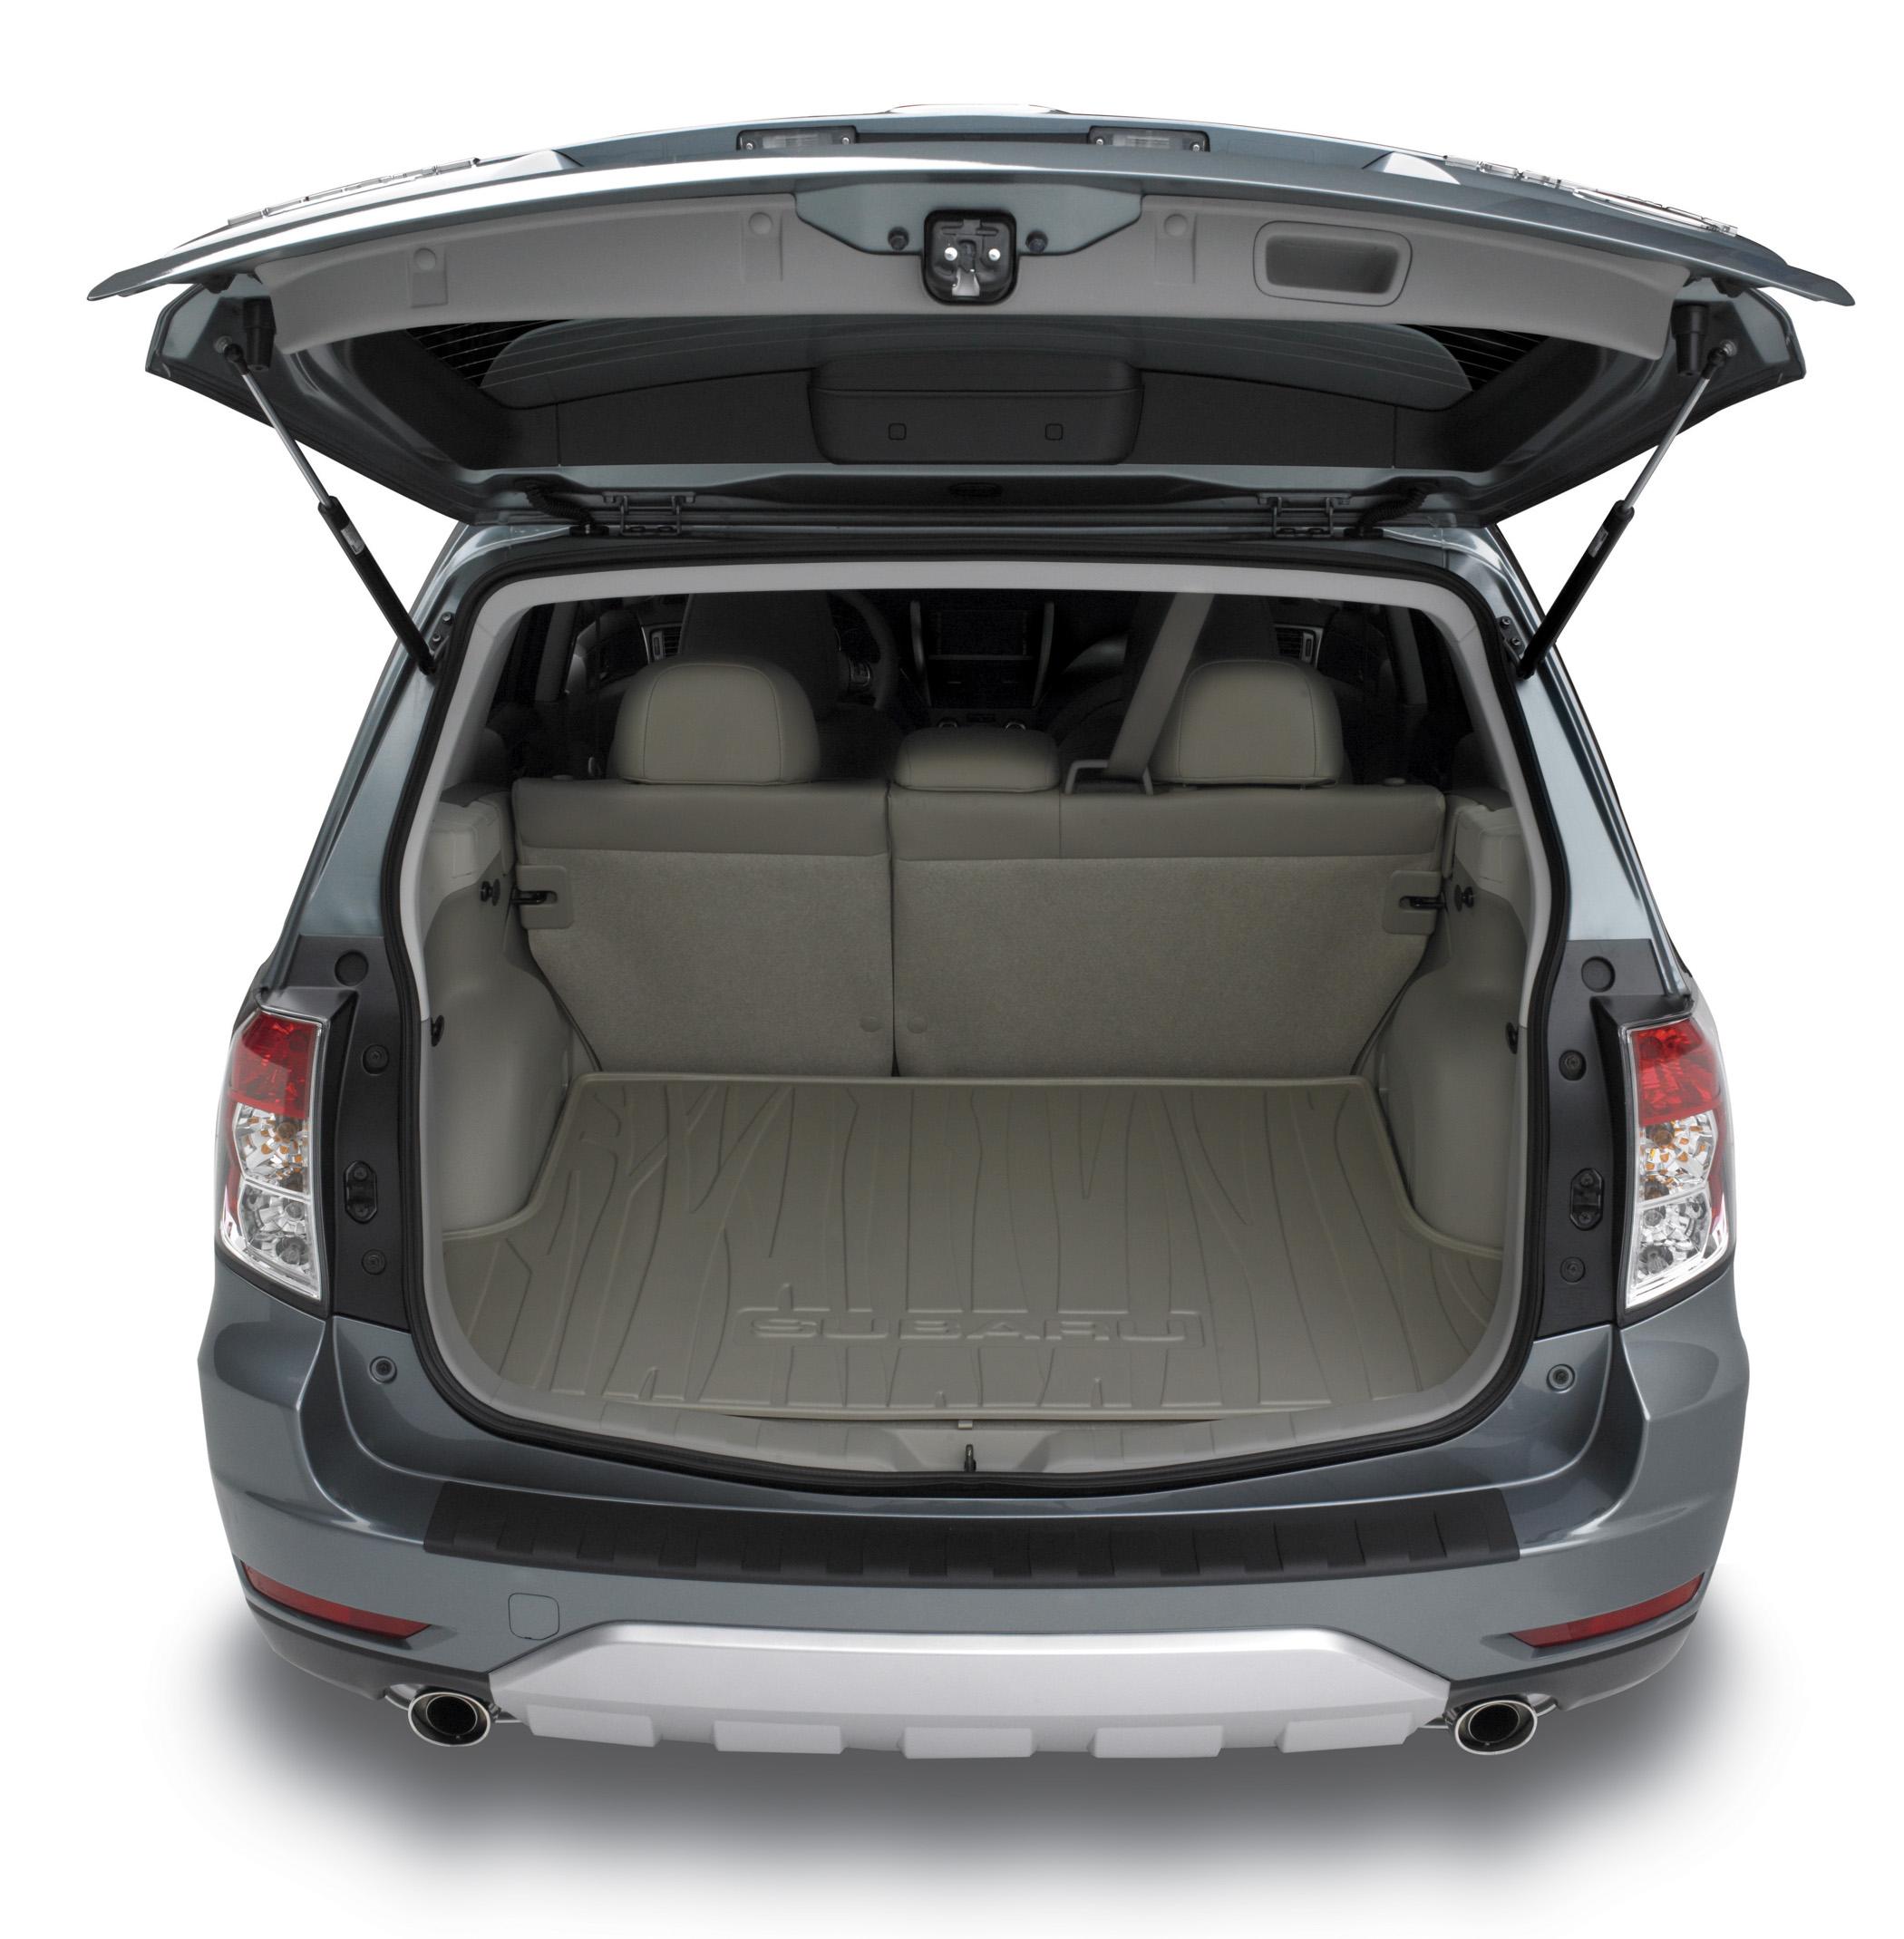 Subaru Accessories Forester Tents : Shop genuine subaru forester accessories of